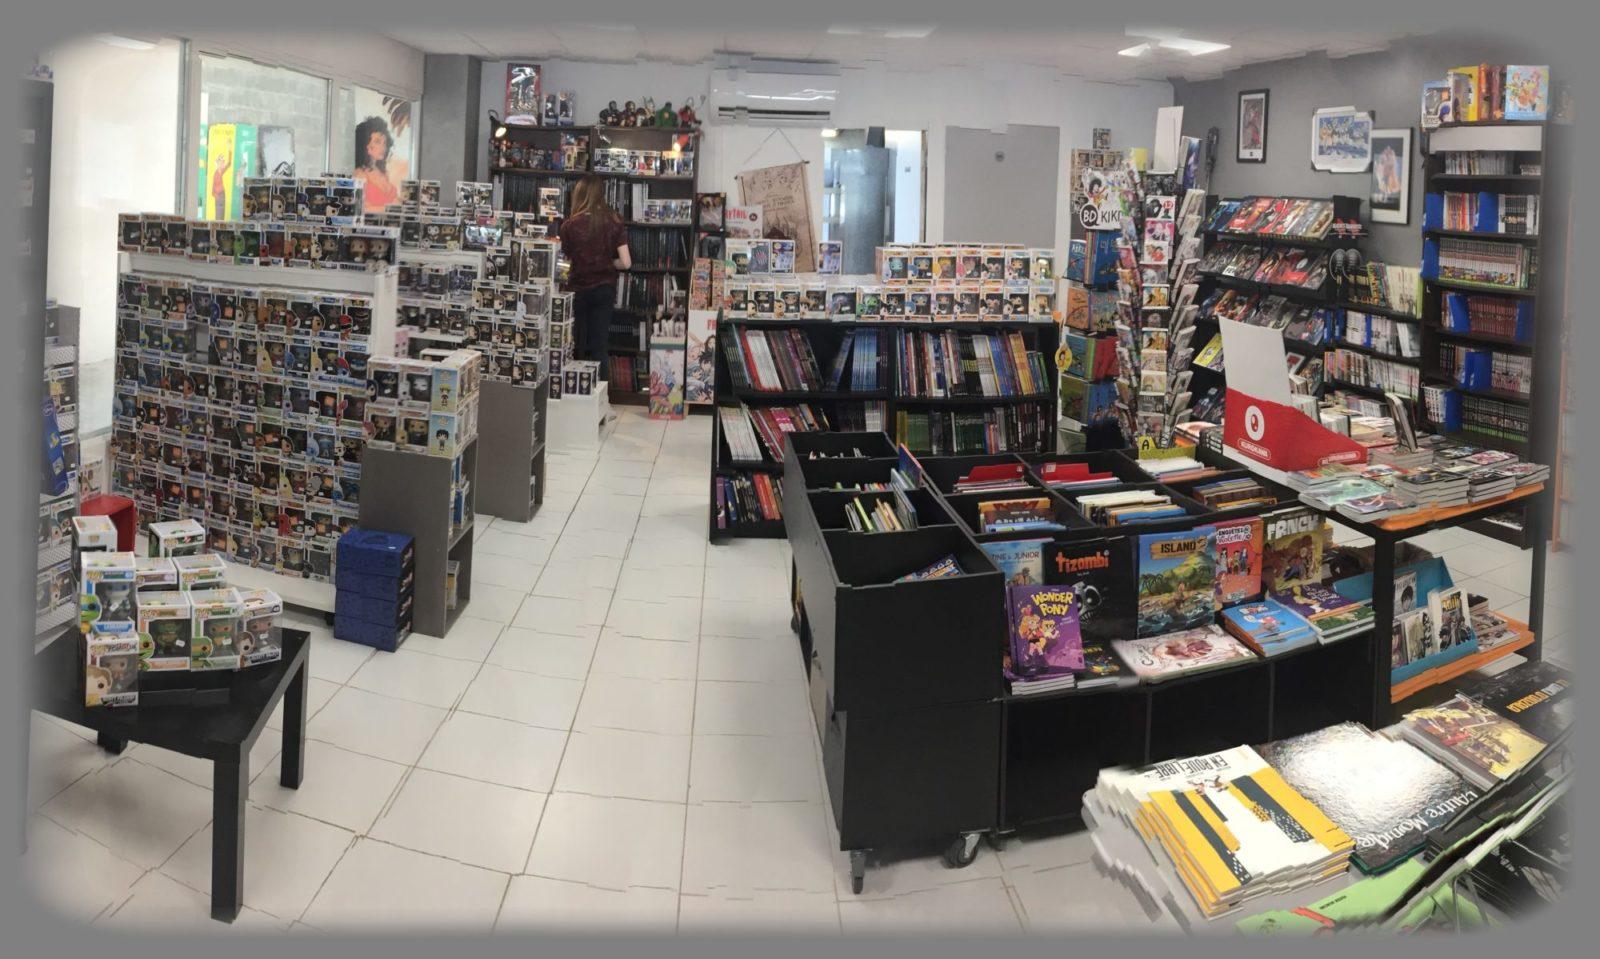 Librairie Gribouille